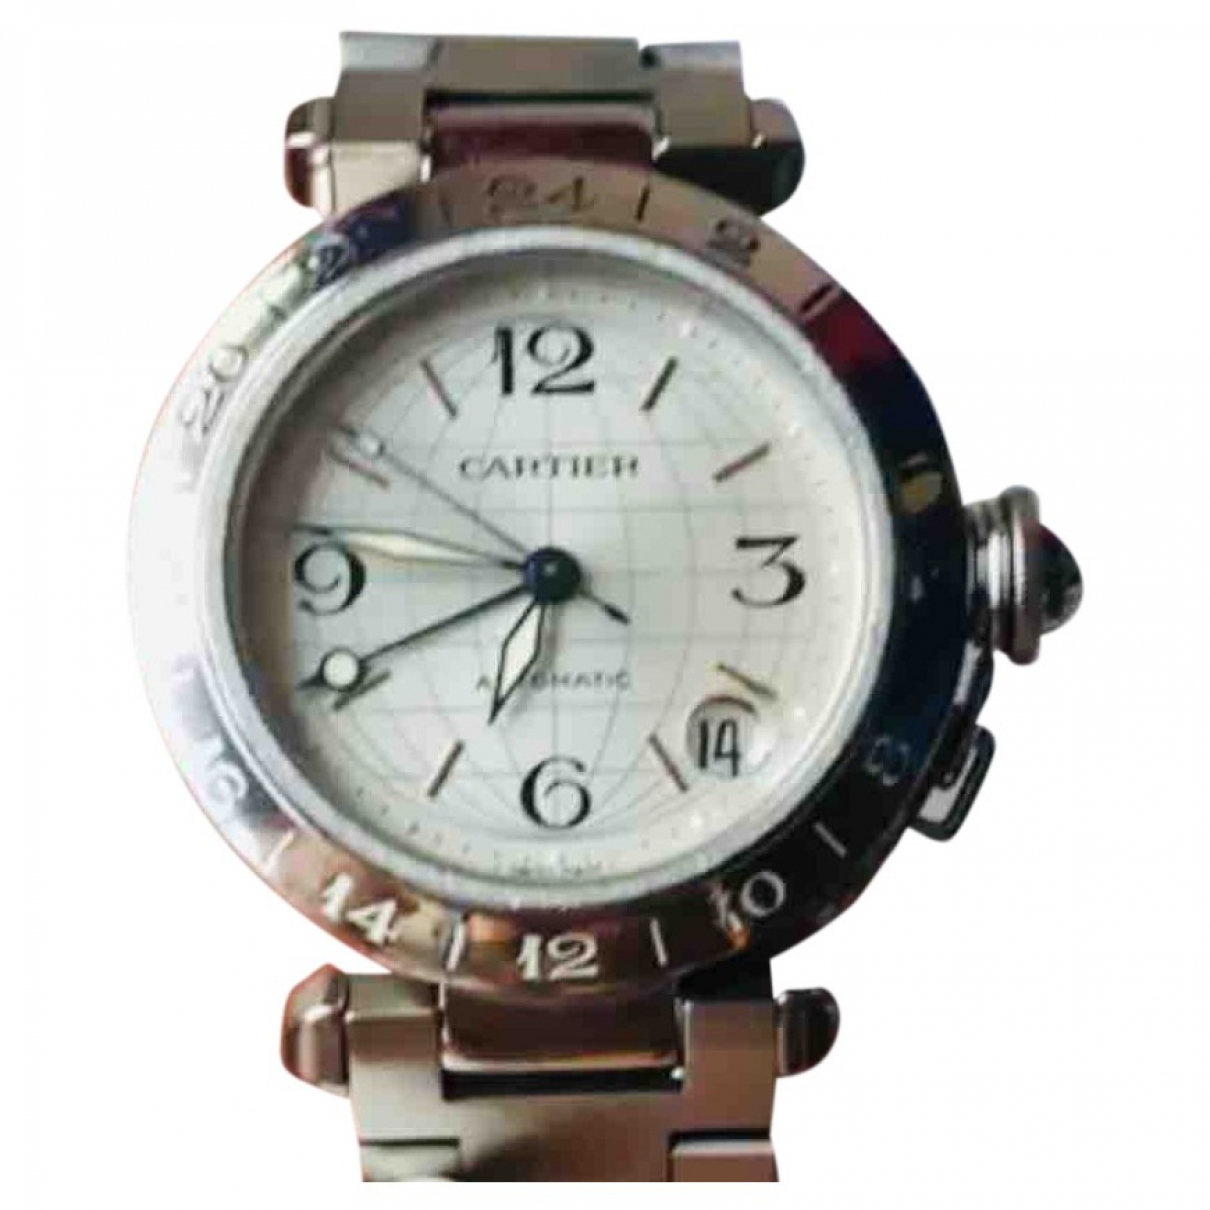 Cartier Pasha GMT Uhr in  Silber Stahl